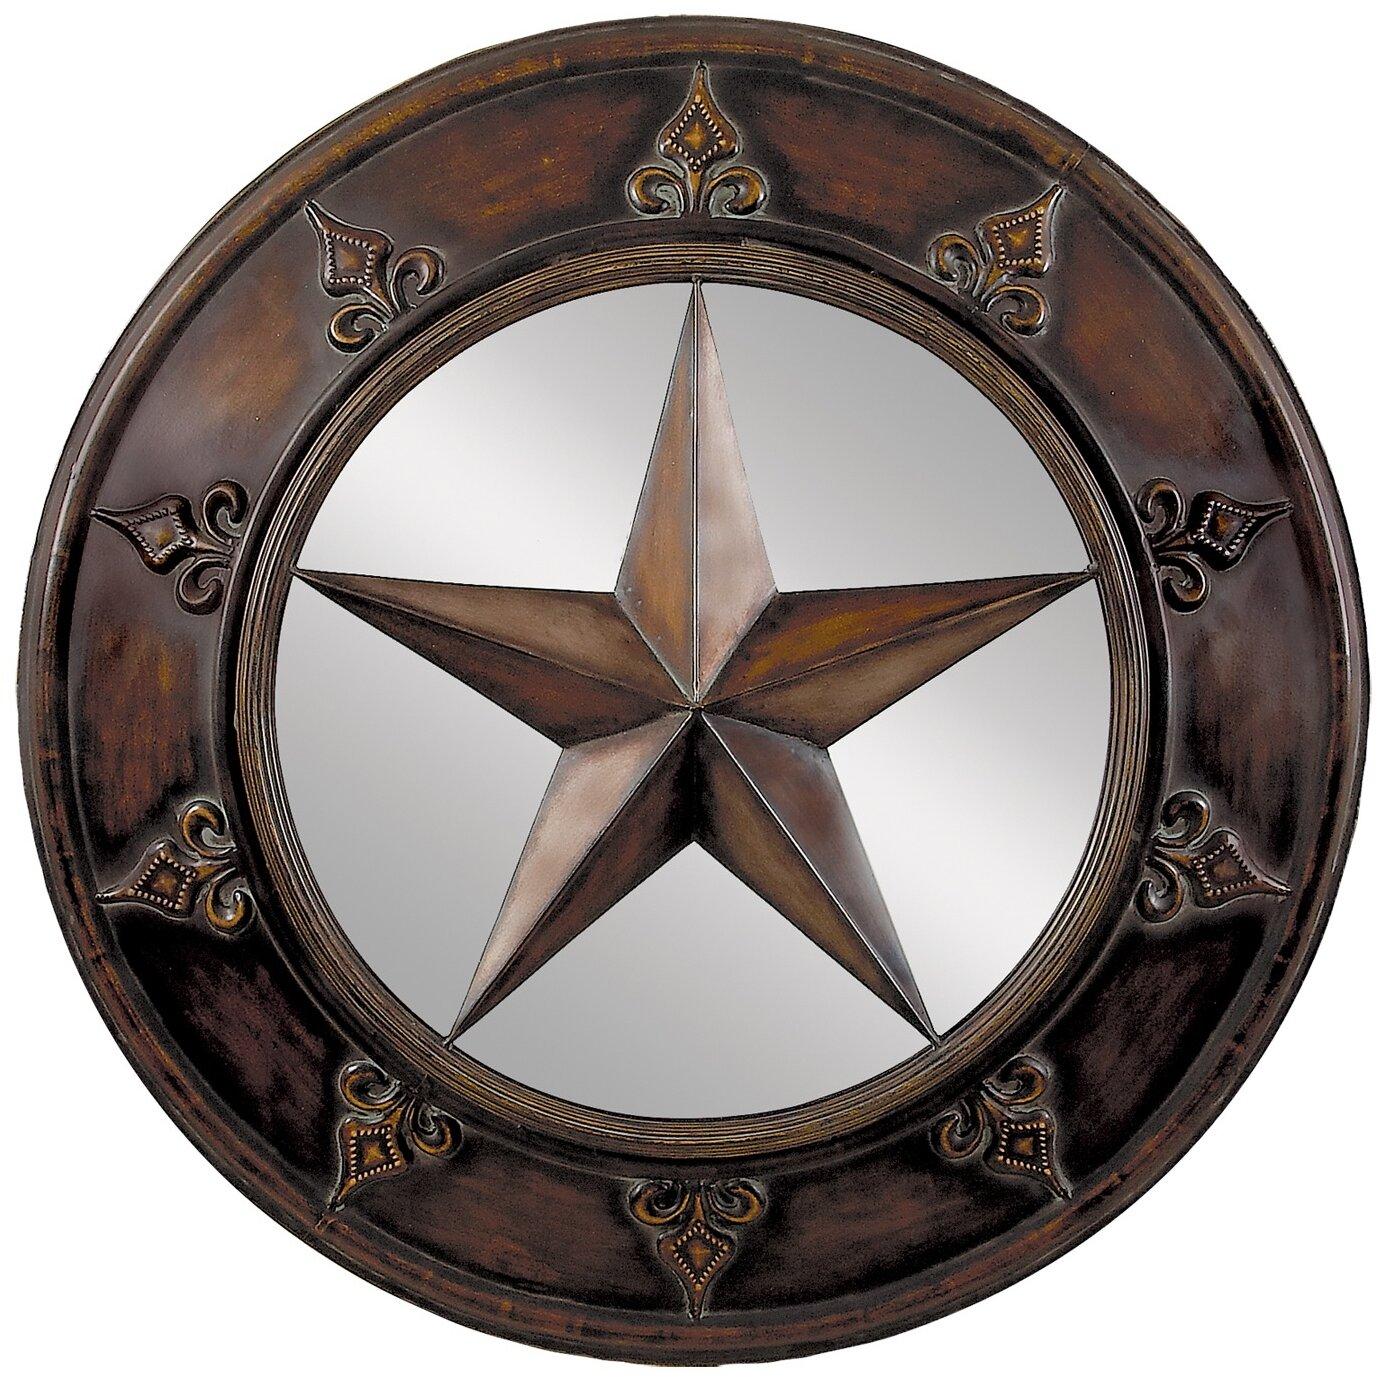 Glass Star Wall Decor : Aspire star mirror wall d?cor reviews wayfair